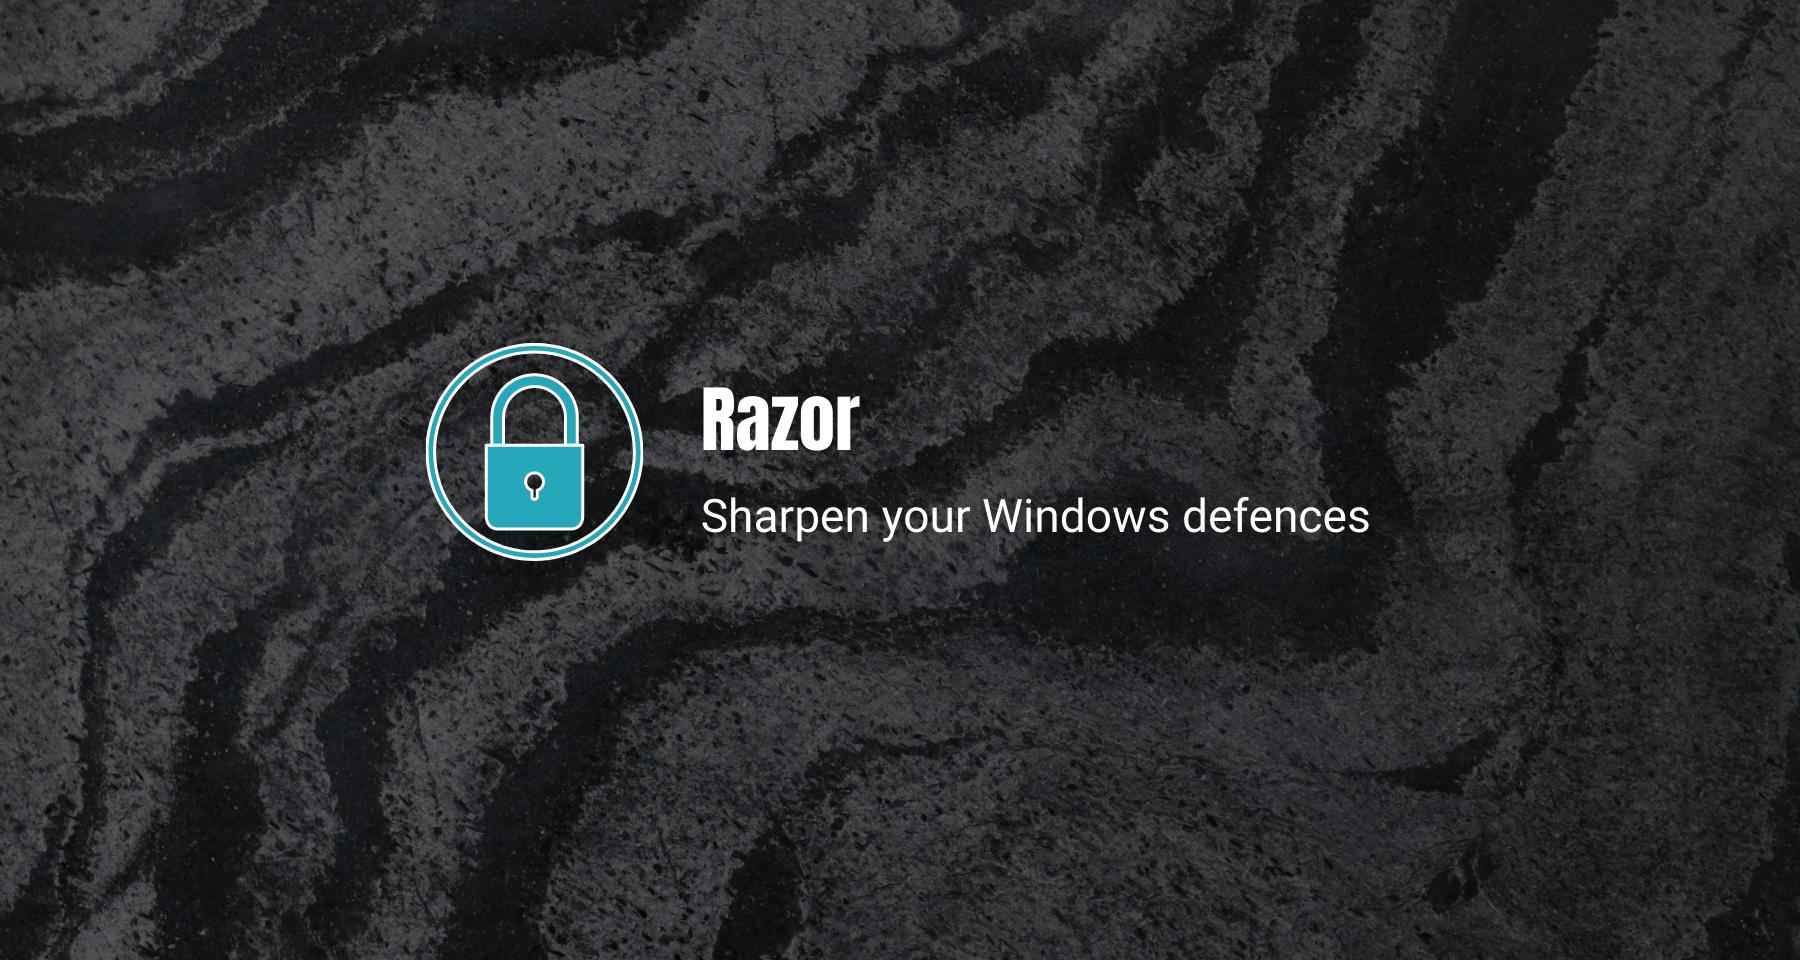 Razor header image